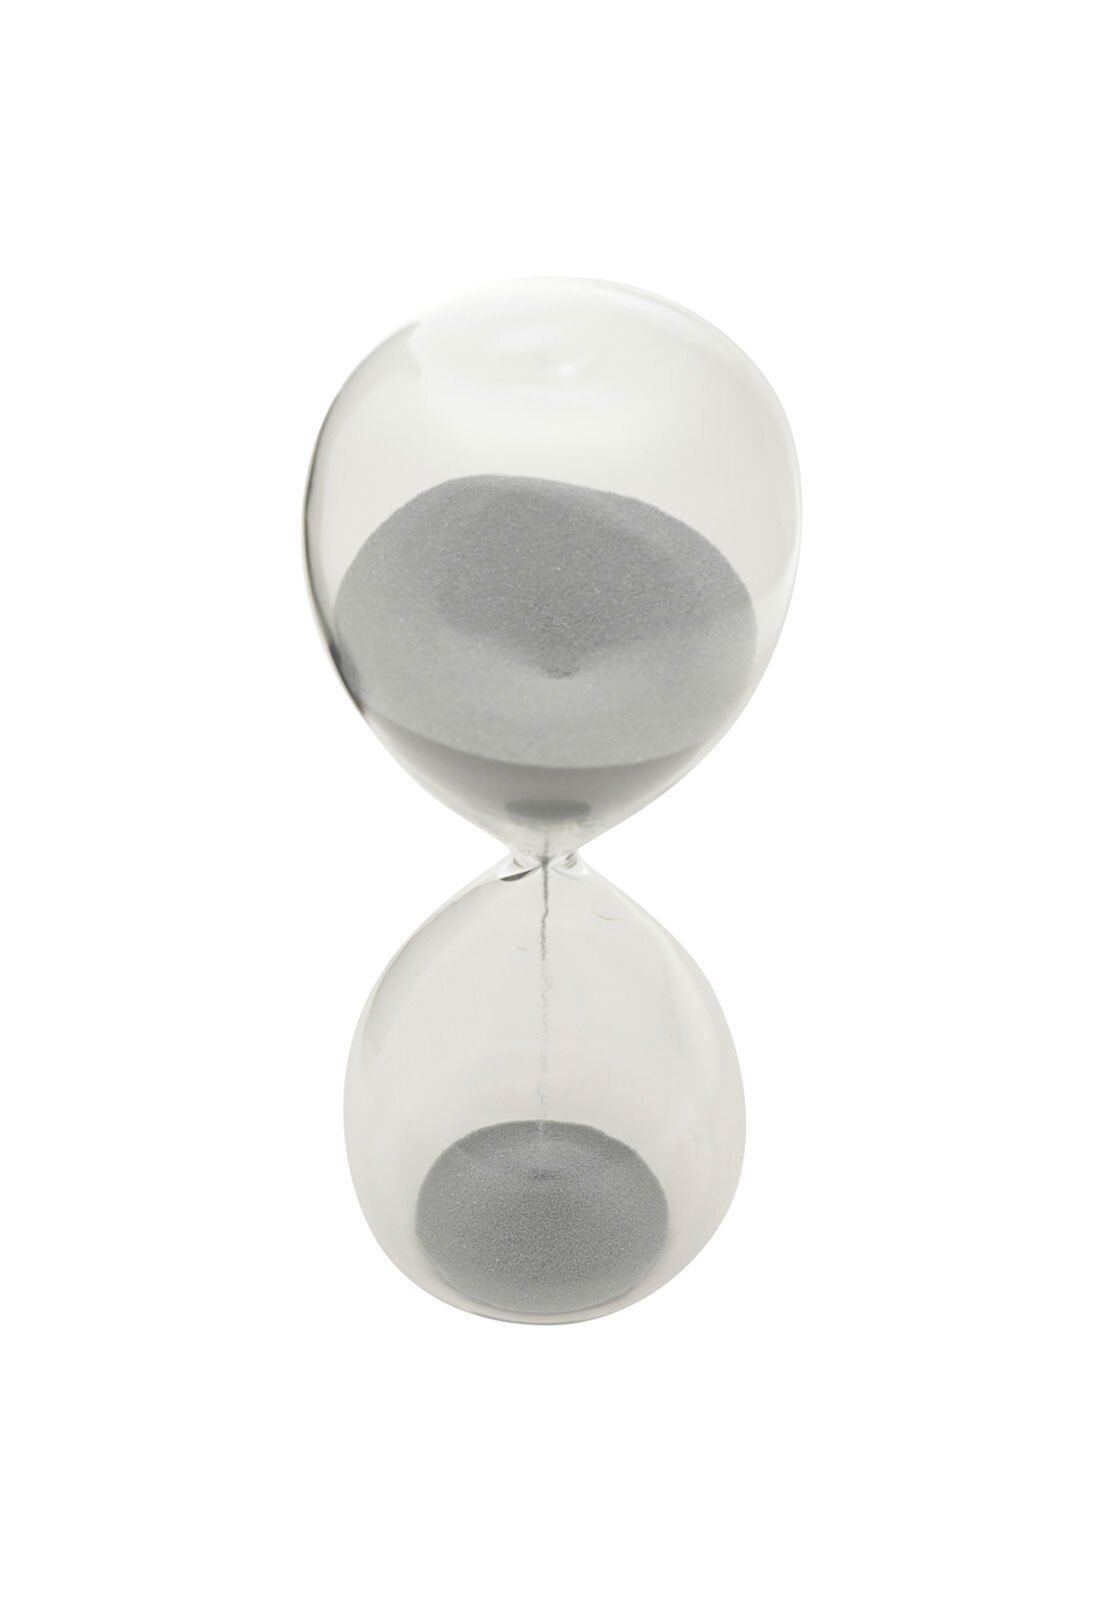 AMPULHETA VIDRO CLEAR GLASS PRATA 20 MIN 6,5X6,5X17CM - URBAN 42746